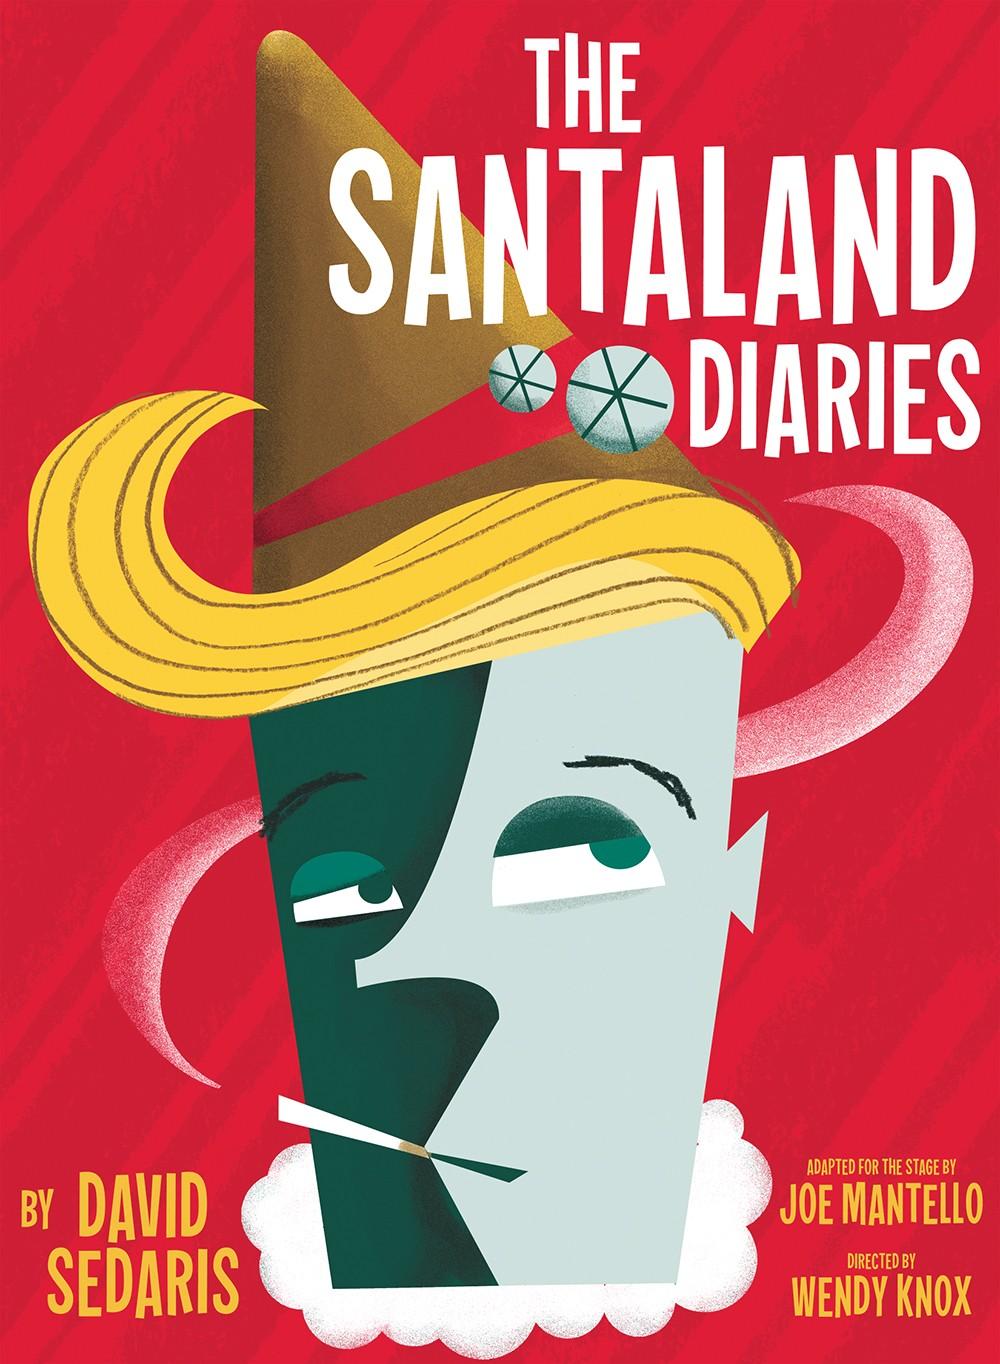 The Santaland Diaries runs Dec. 6-22 at Coeur d'Alene's Lake City Playhouse.